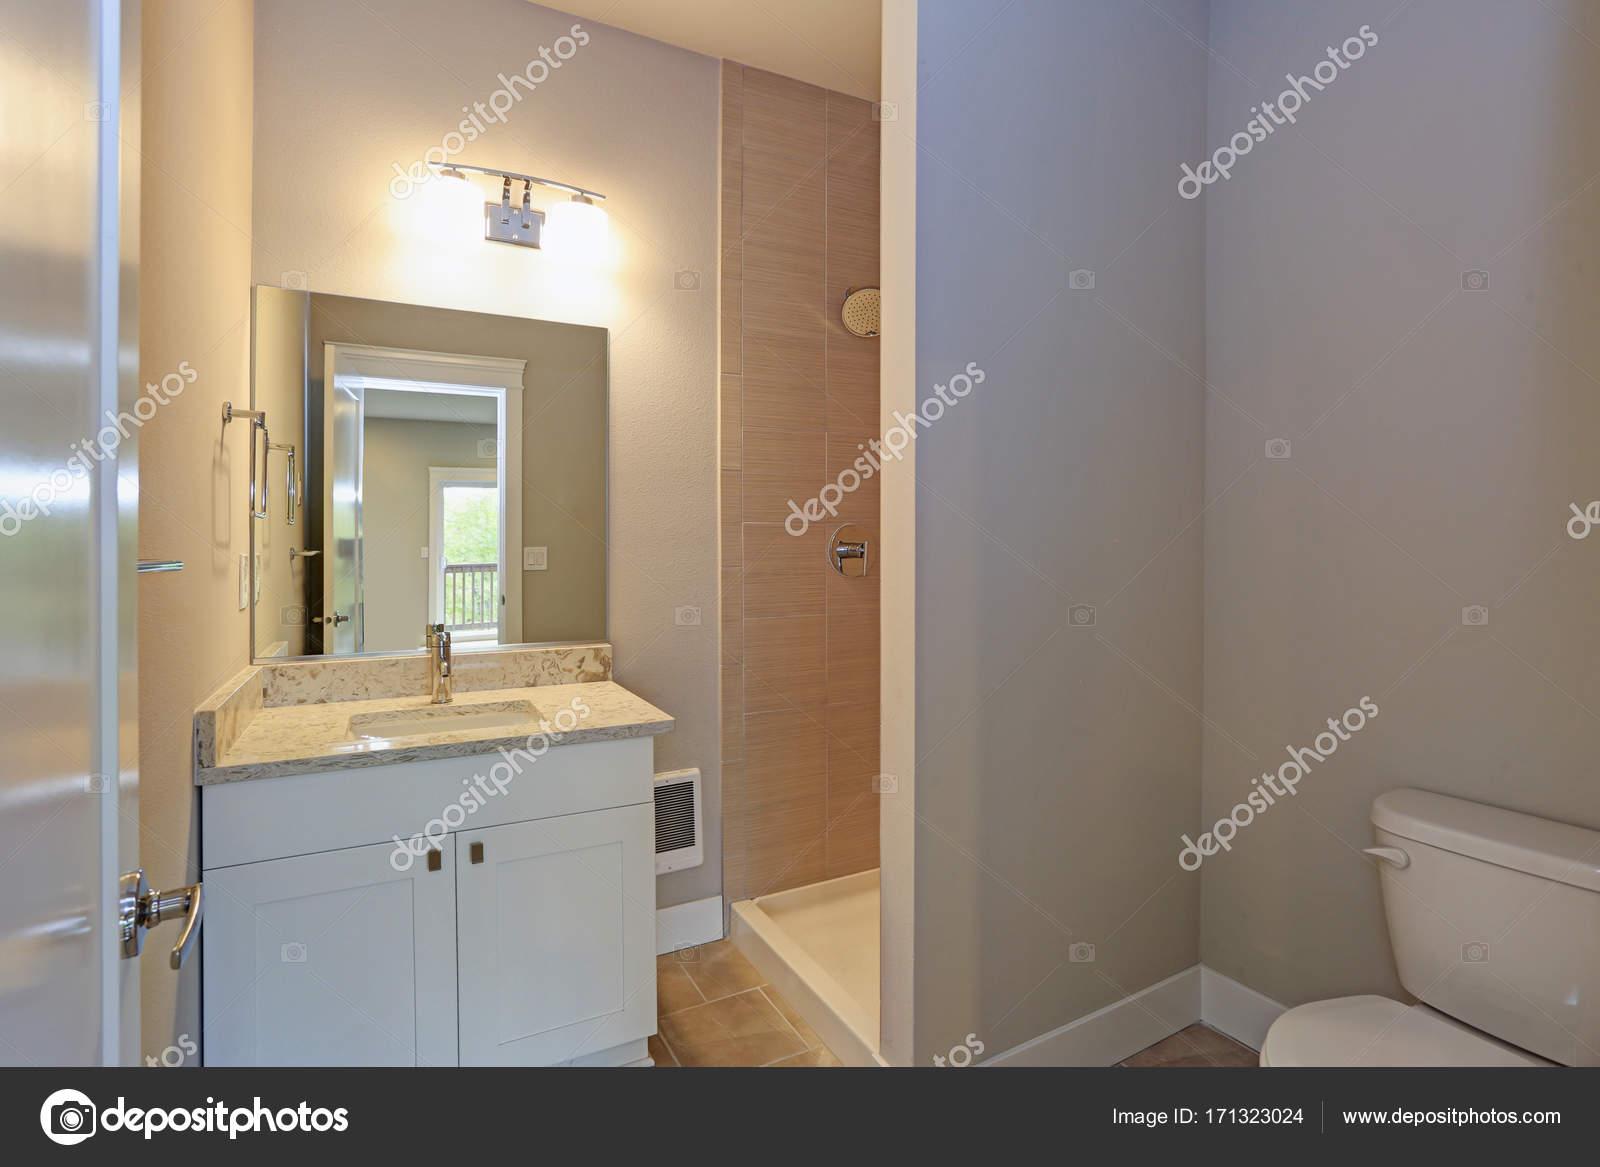 Bagno Beige E Bianco : Contemporanea bagno bianco e beige u foto stock alabn